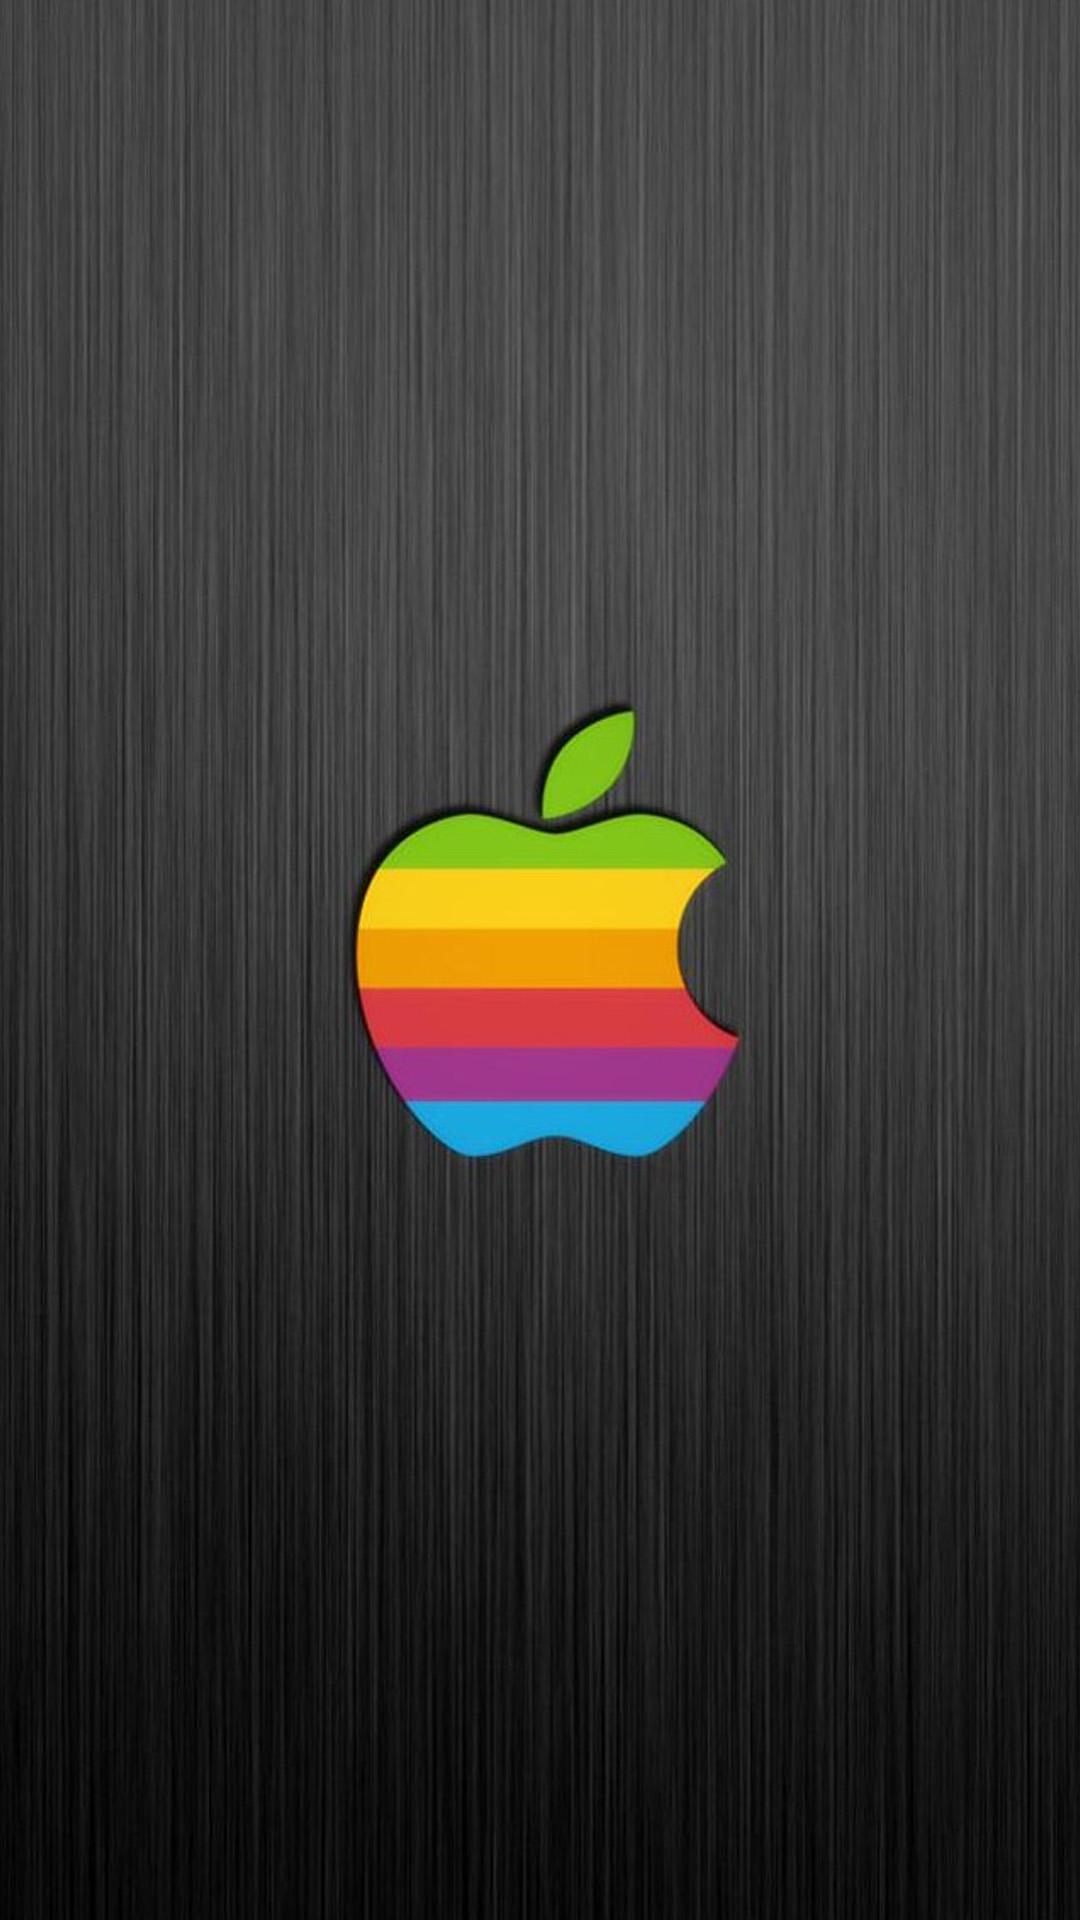 Free Download Apple Iphone 6 Plus Wallpaper 02 Iphone 6 Plus